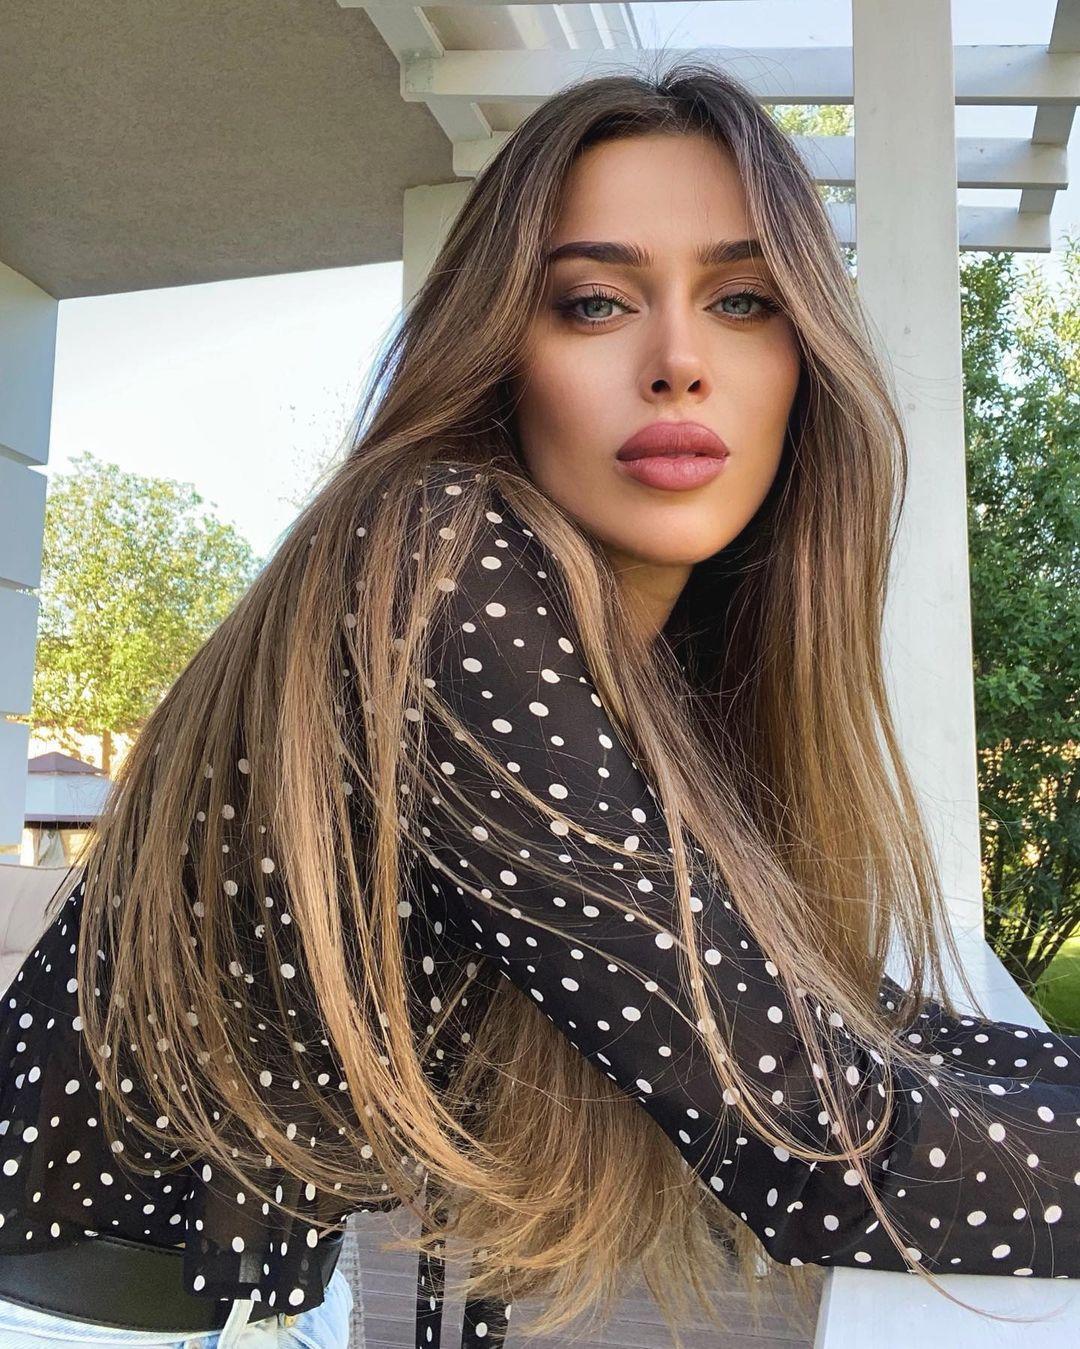 Miranda-Sheliya-Wallpapers-Insta-Fit-Bio-8